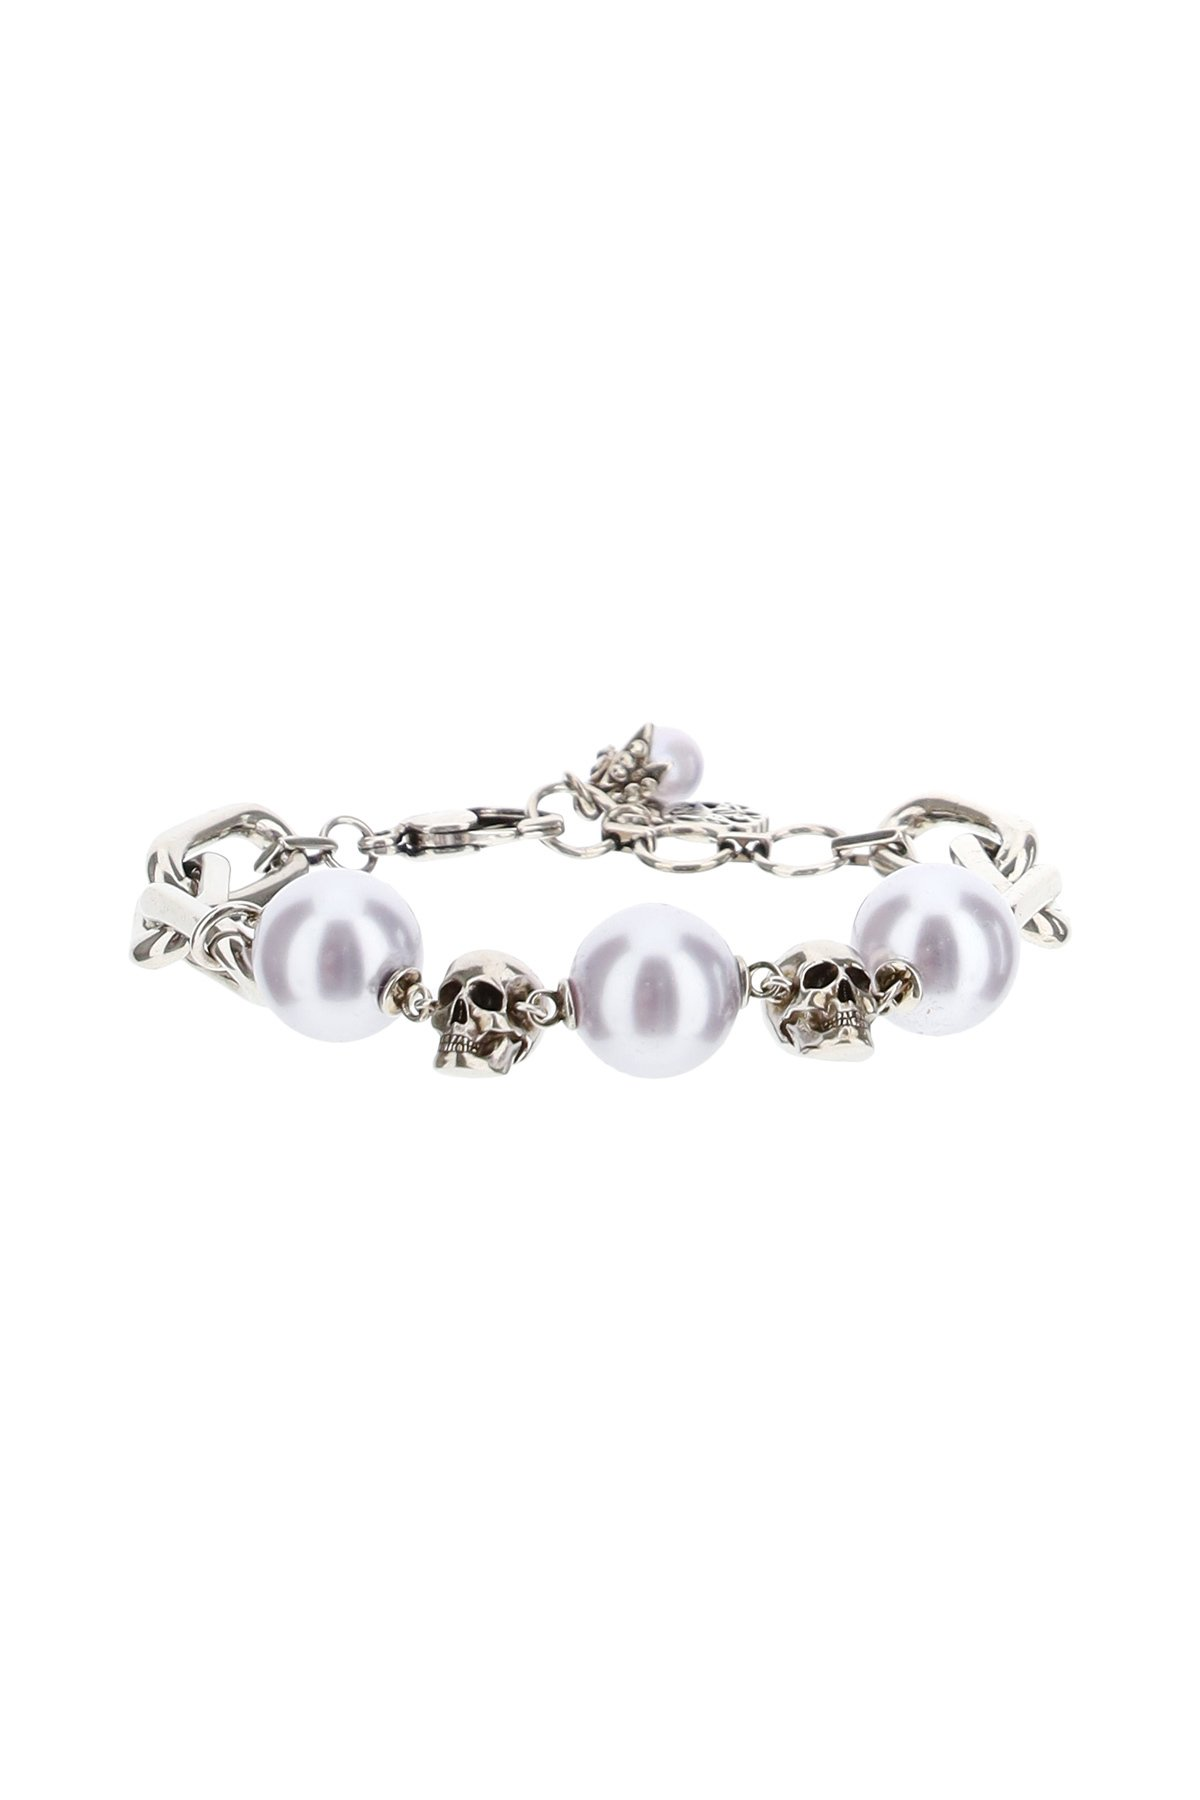 Alexander mcqueen bracciale chain pearl